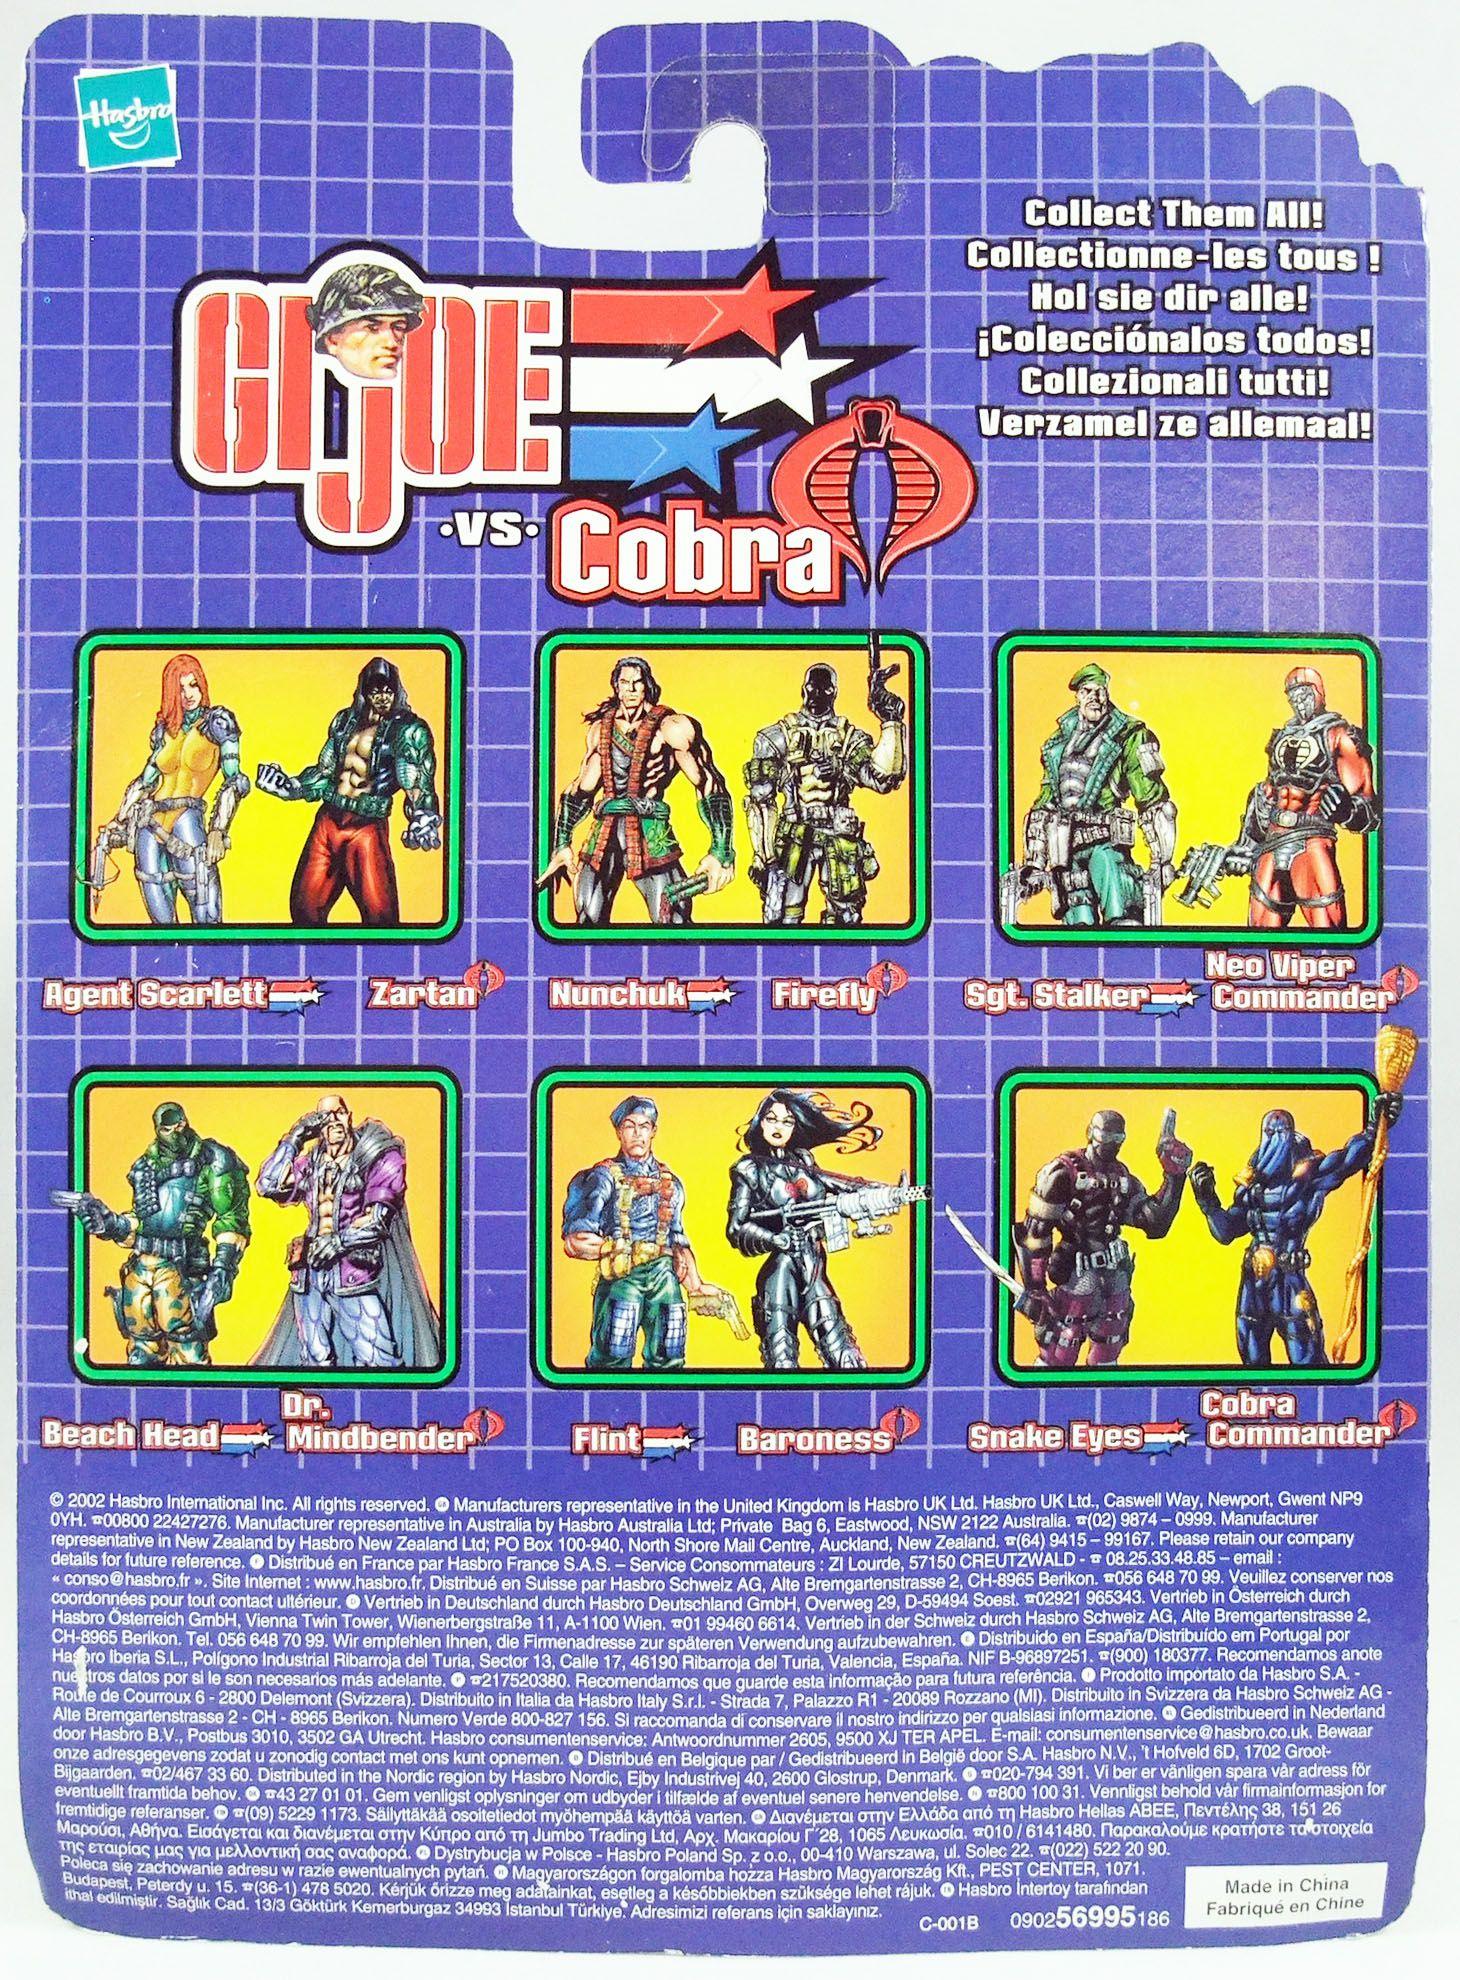 G.I.Joe vs. Cobra - 2002 - Snake Eyes & Cobra Commander